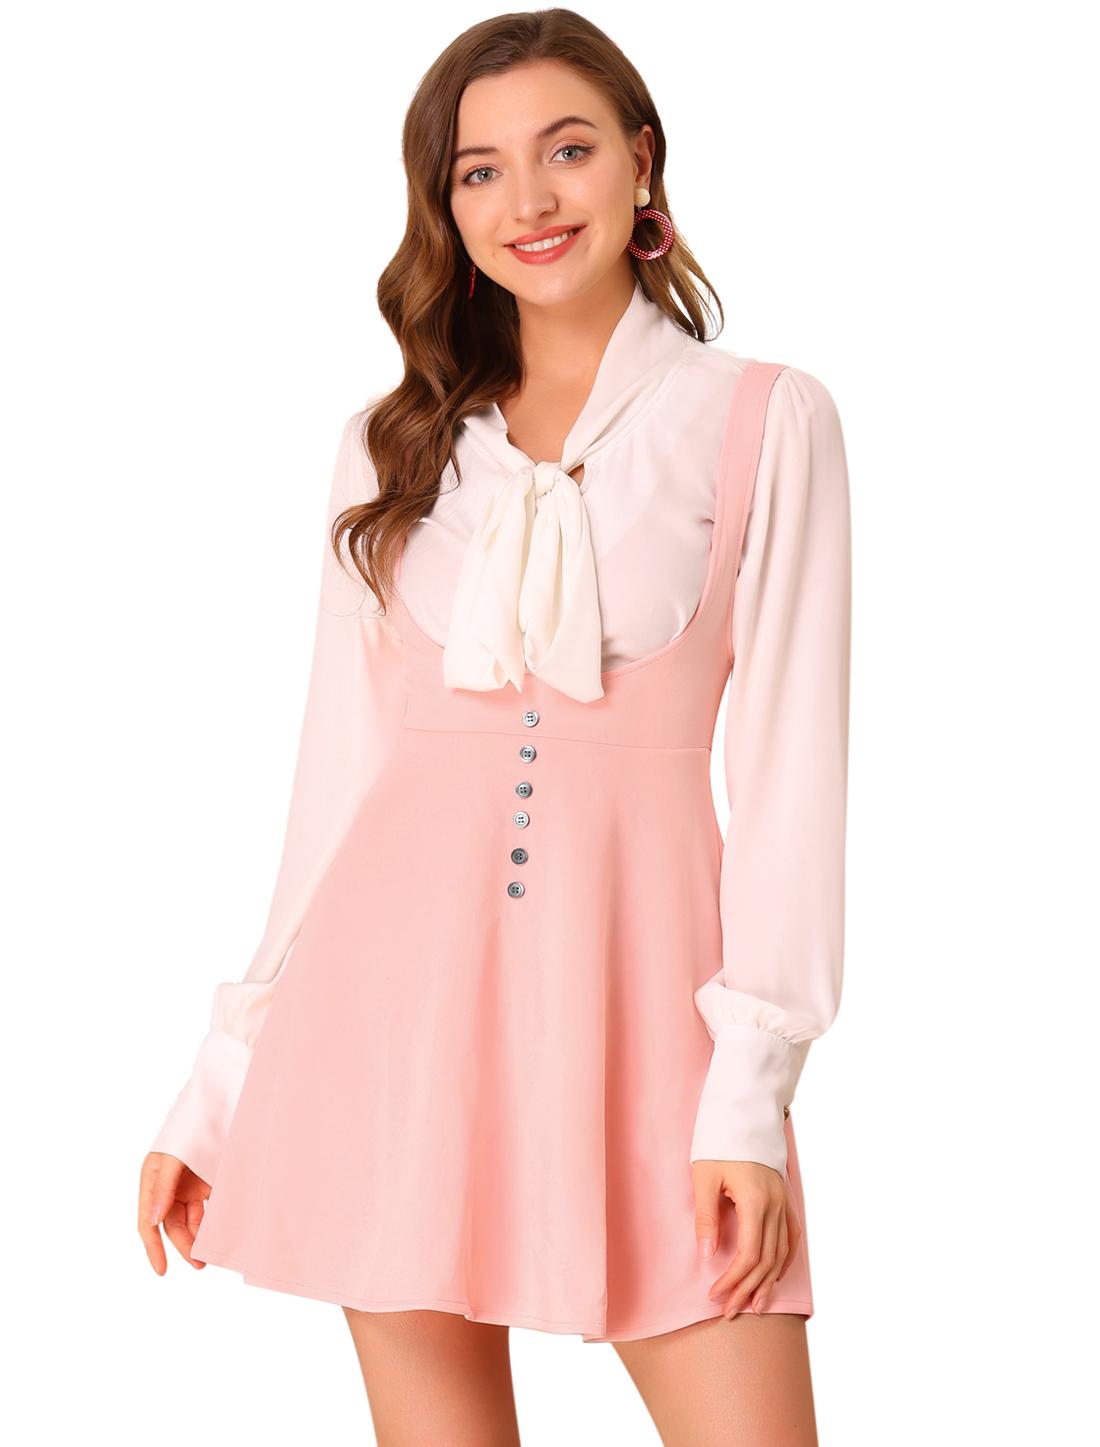 Allegra K Women Button Decor Flared Hem Above Knee Dress Suspender Skirt Pink XS